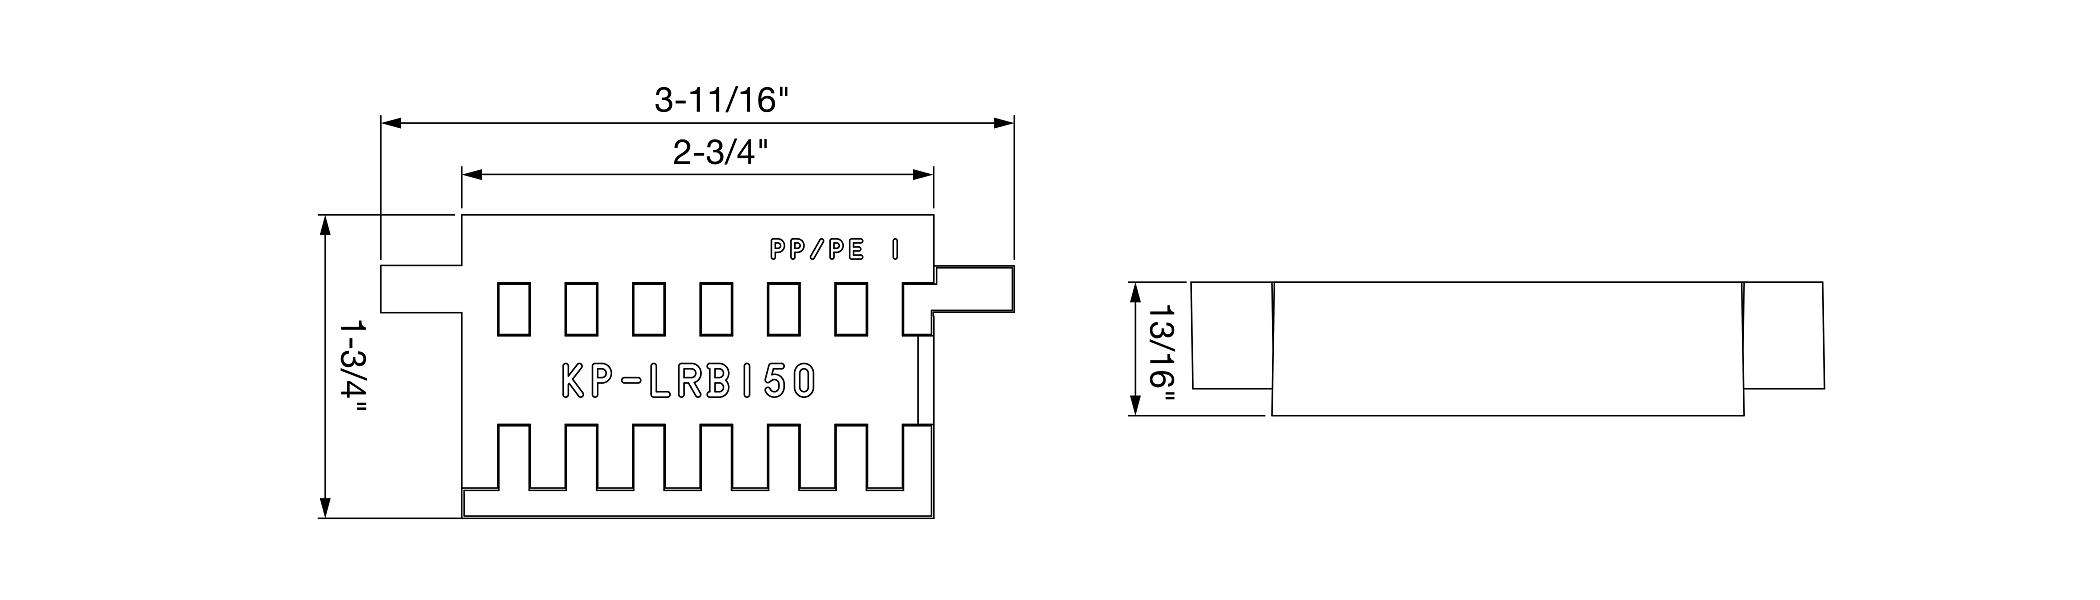 KP-LRB150 Drawing